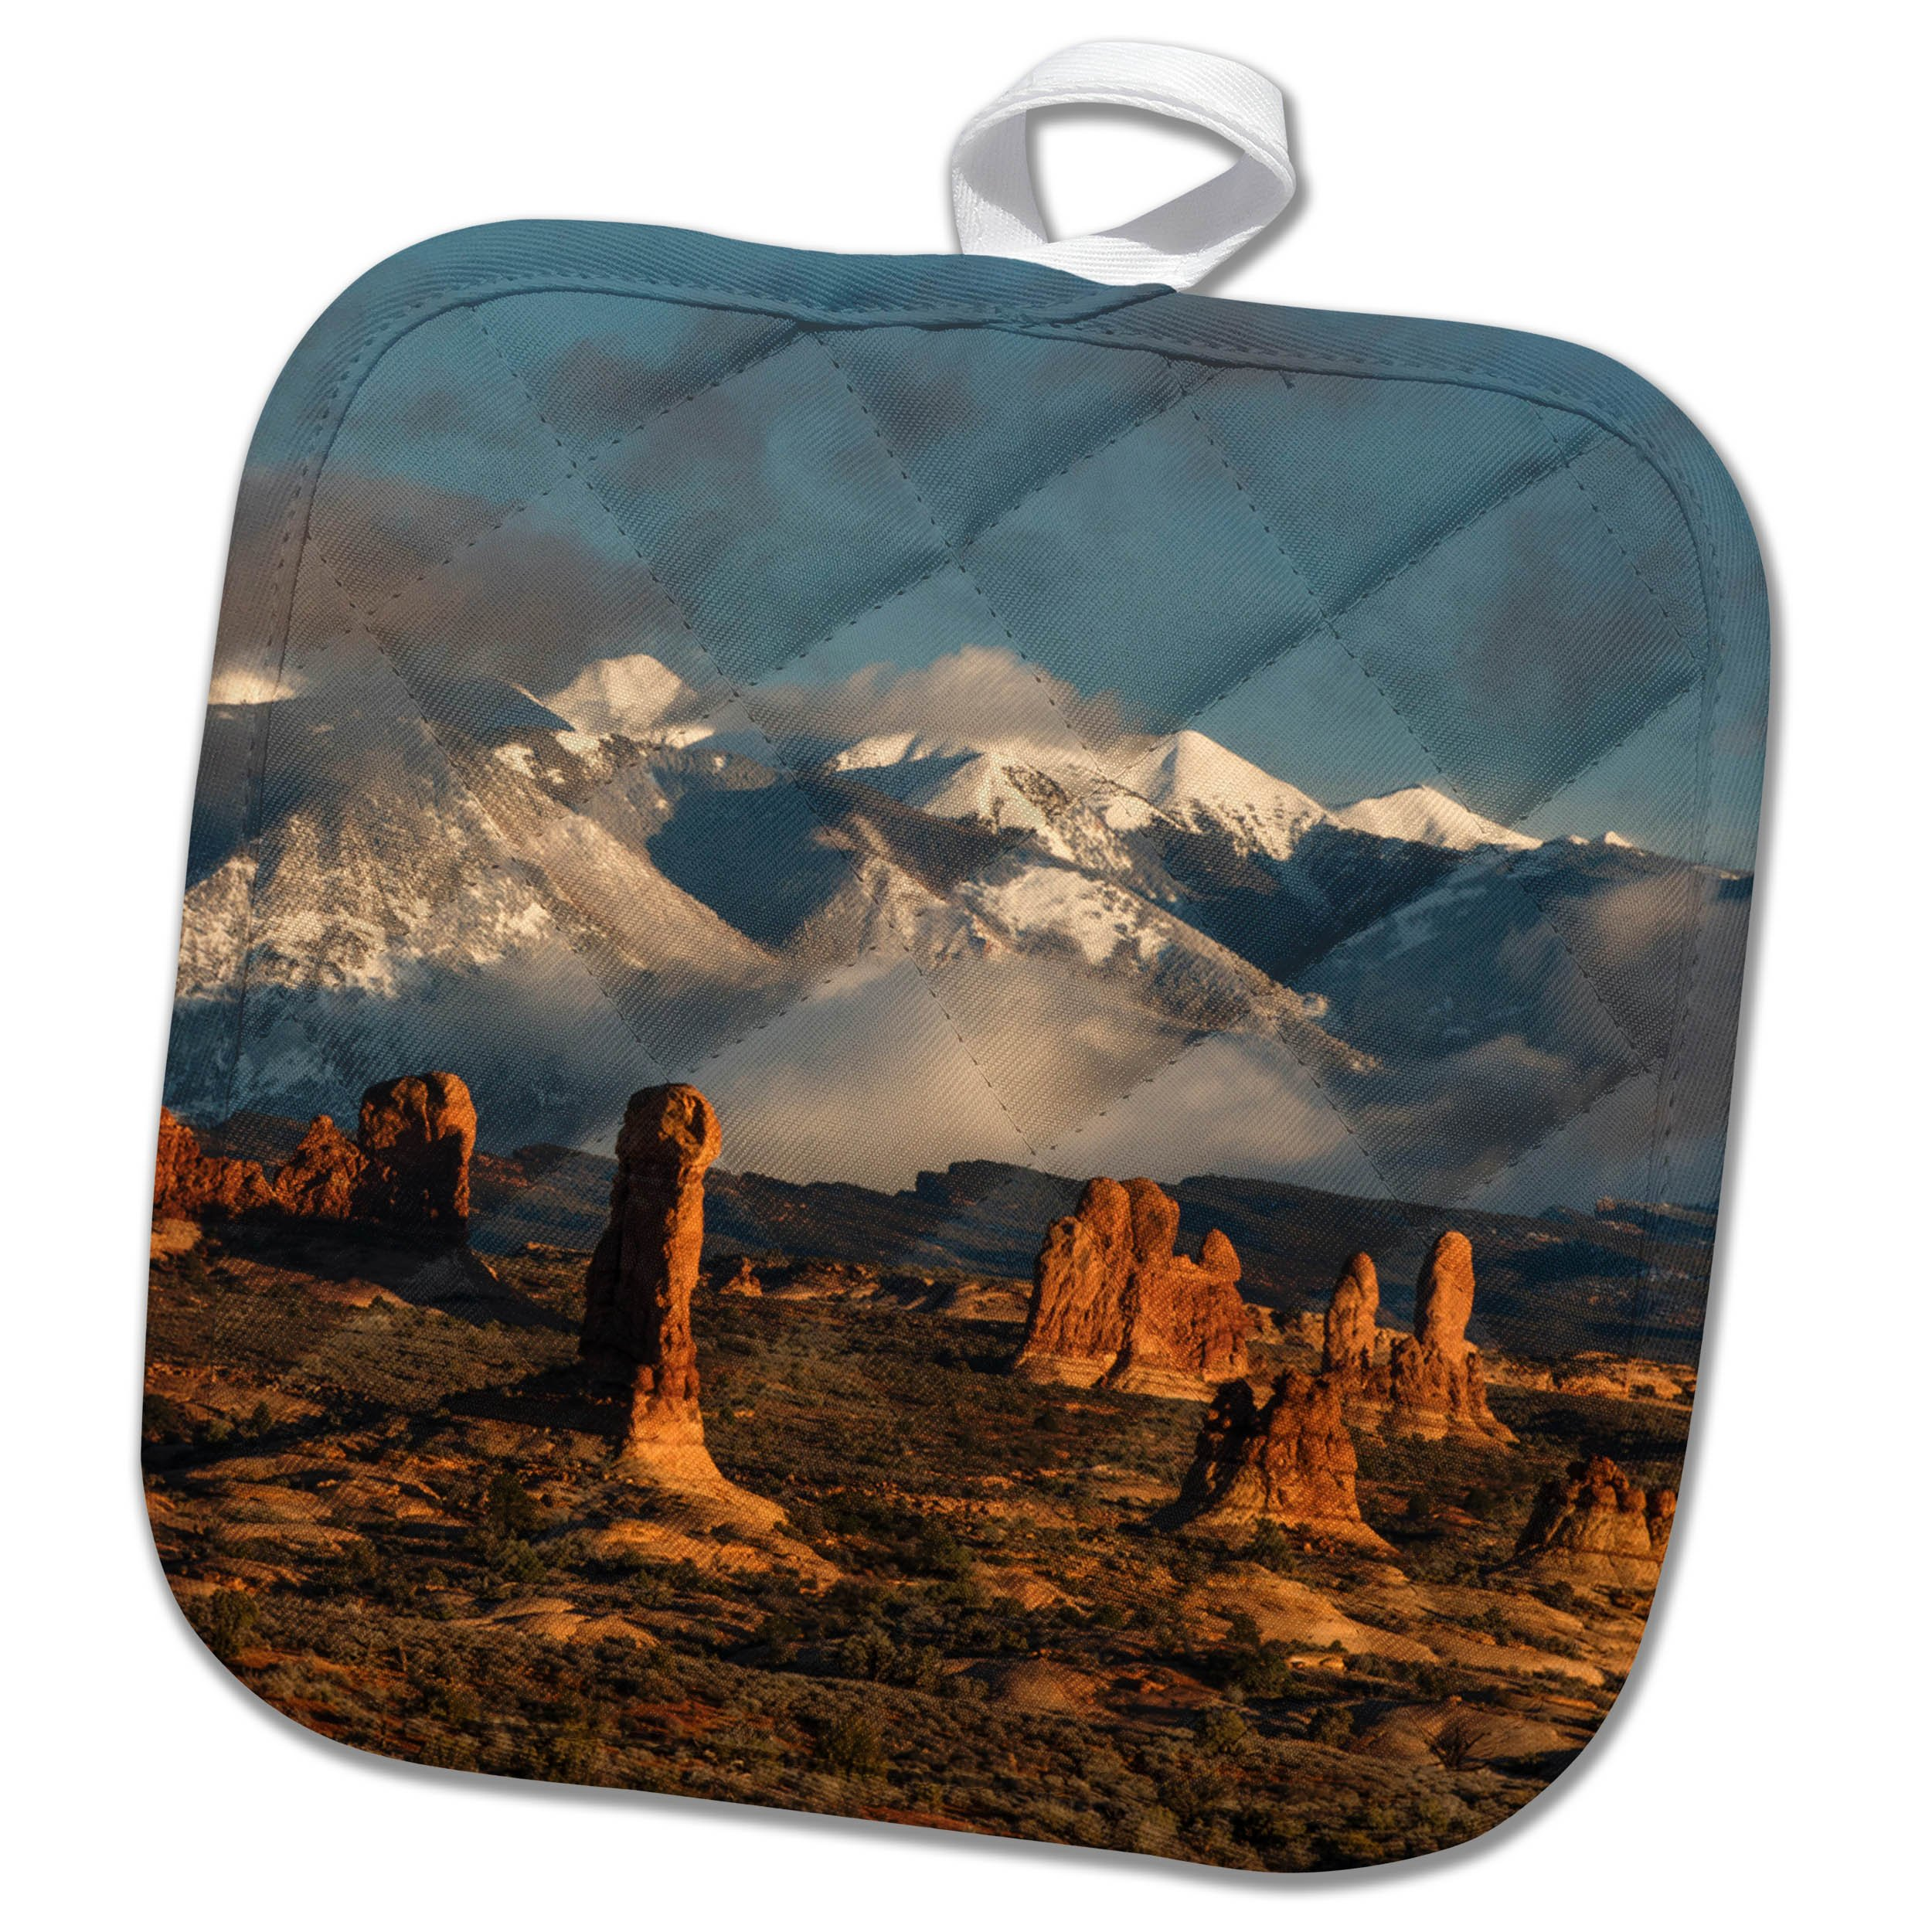 3dRose Danita Delimont - Utah - Usa, Utah, Arches NP. Windows Section with La Sal Mountain range. - 8x8 Potholder (phl_260265_1)